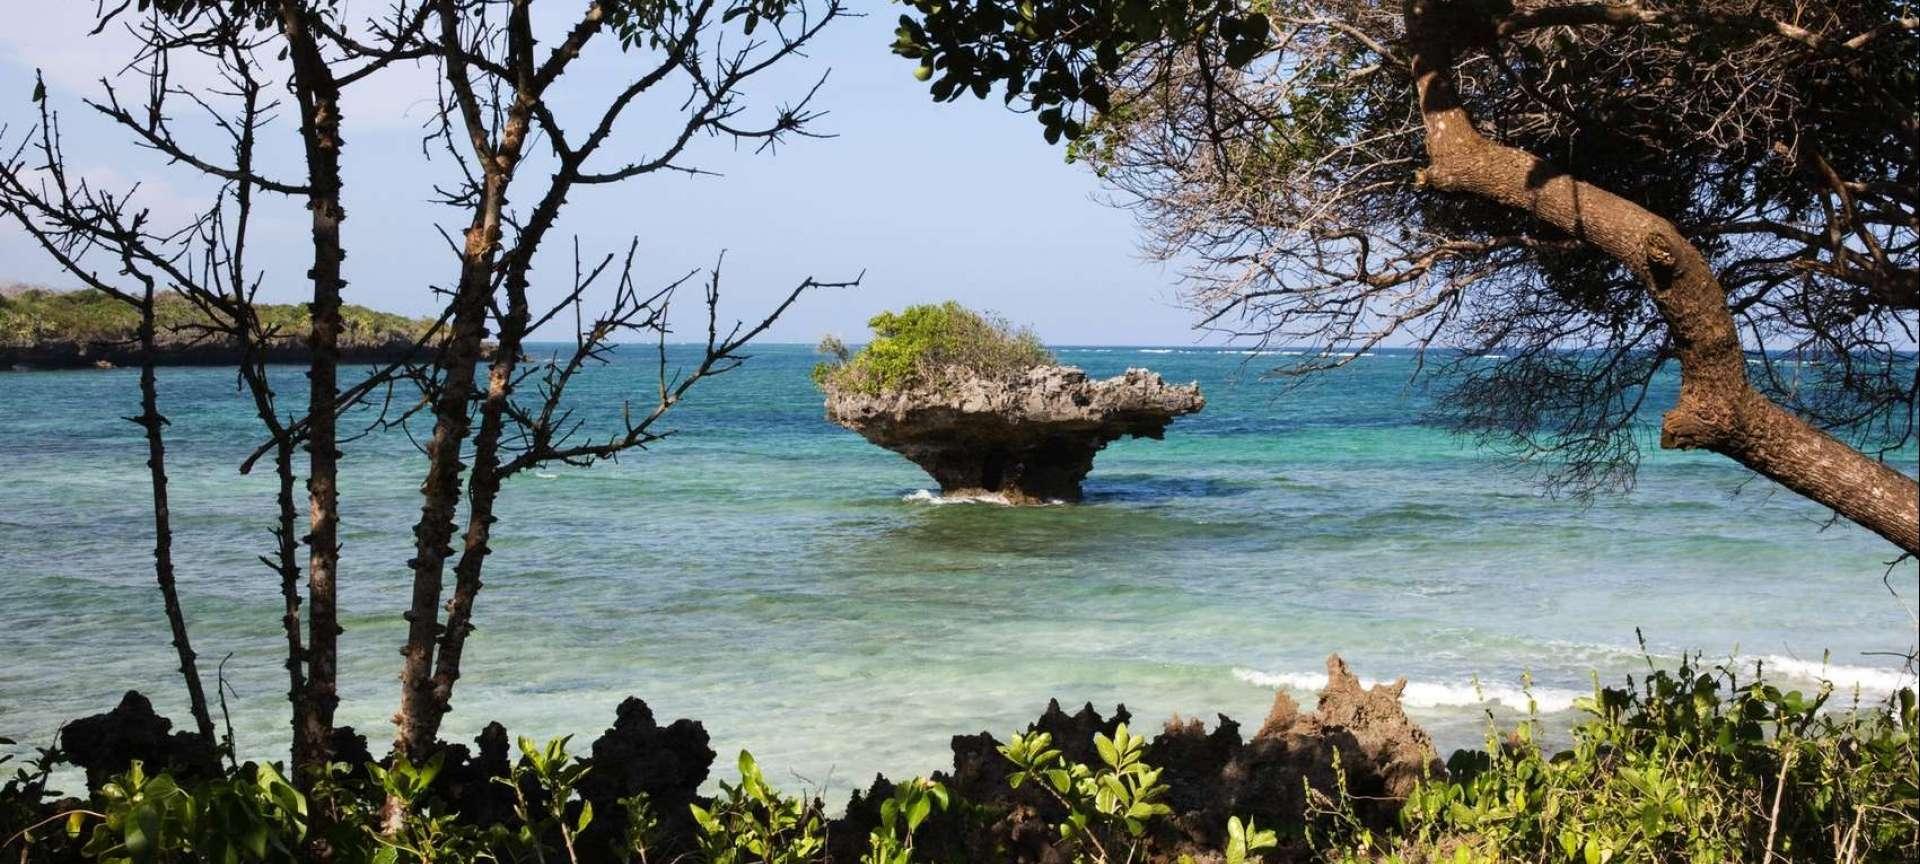 Mombasa - Africa Wildlife Safaris